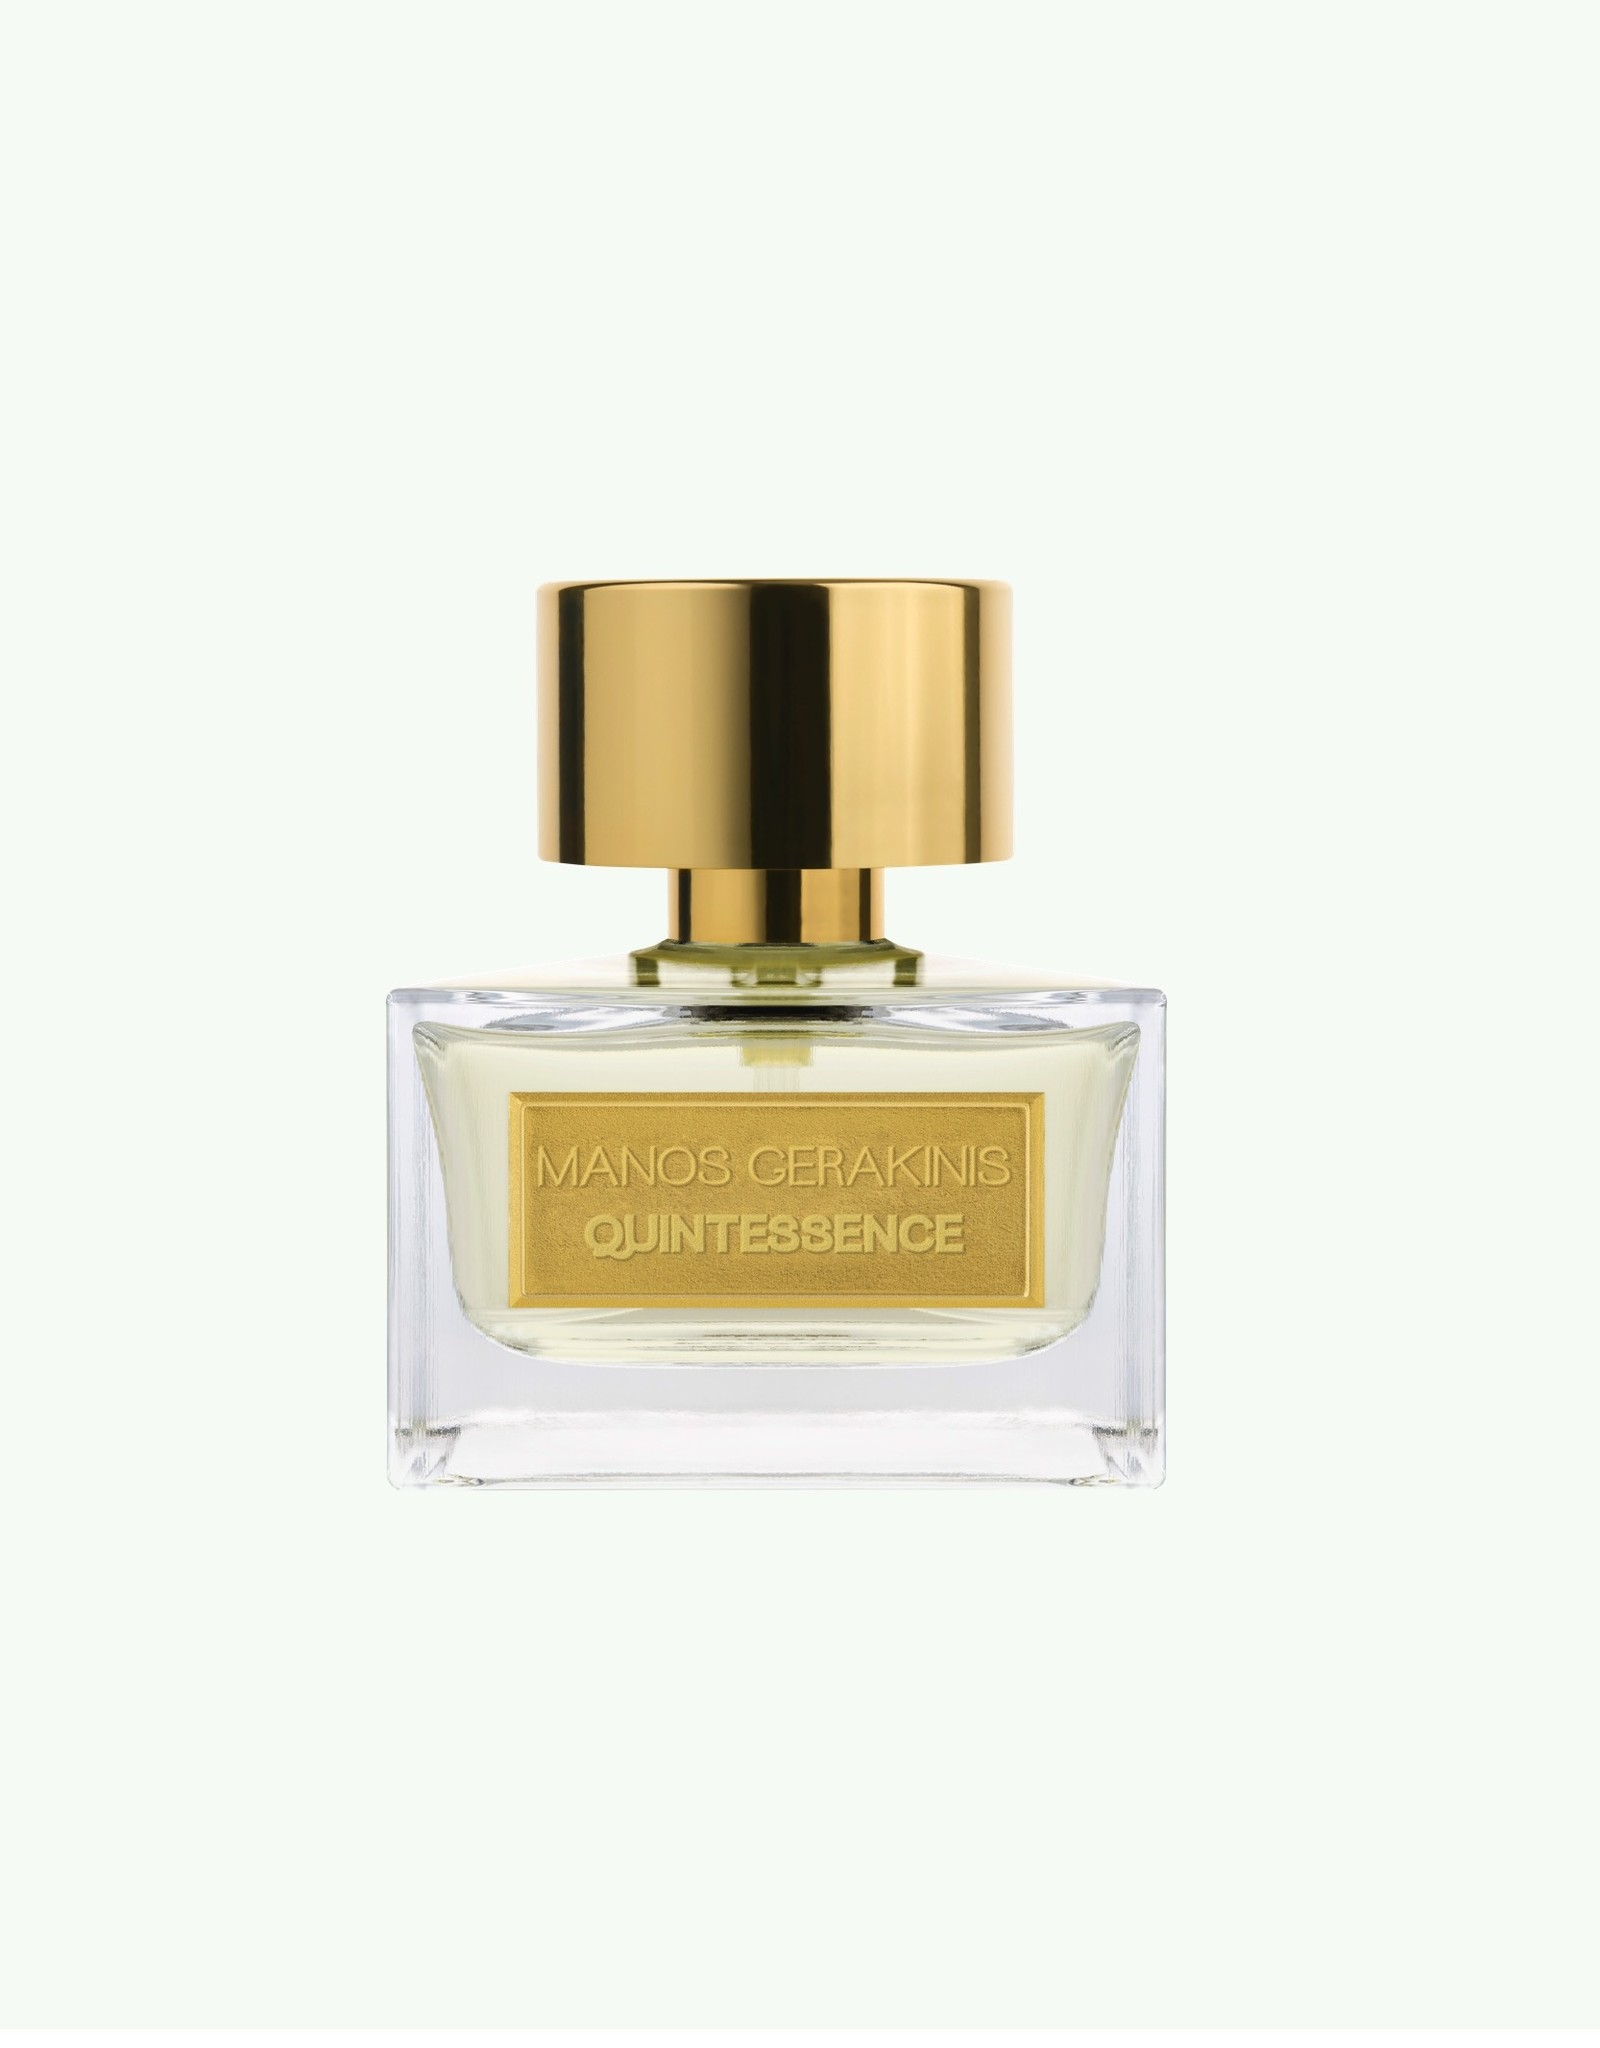 Manos Gerakinis Manos Gerakinis - Quintessence - Eau de Parfum